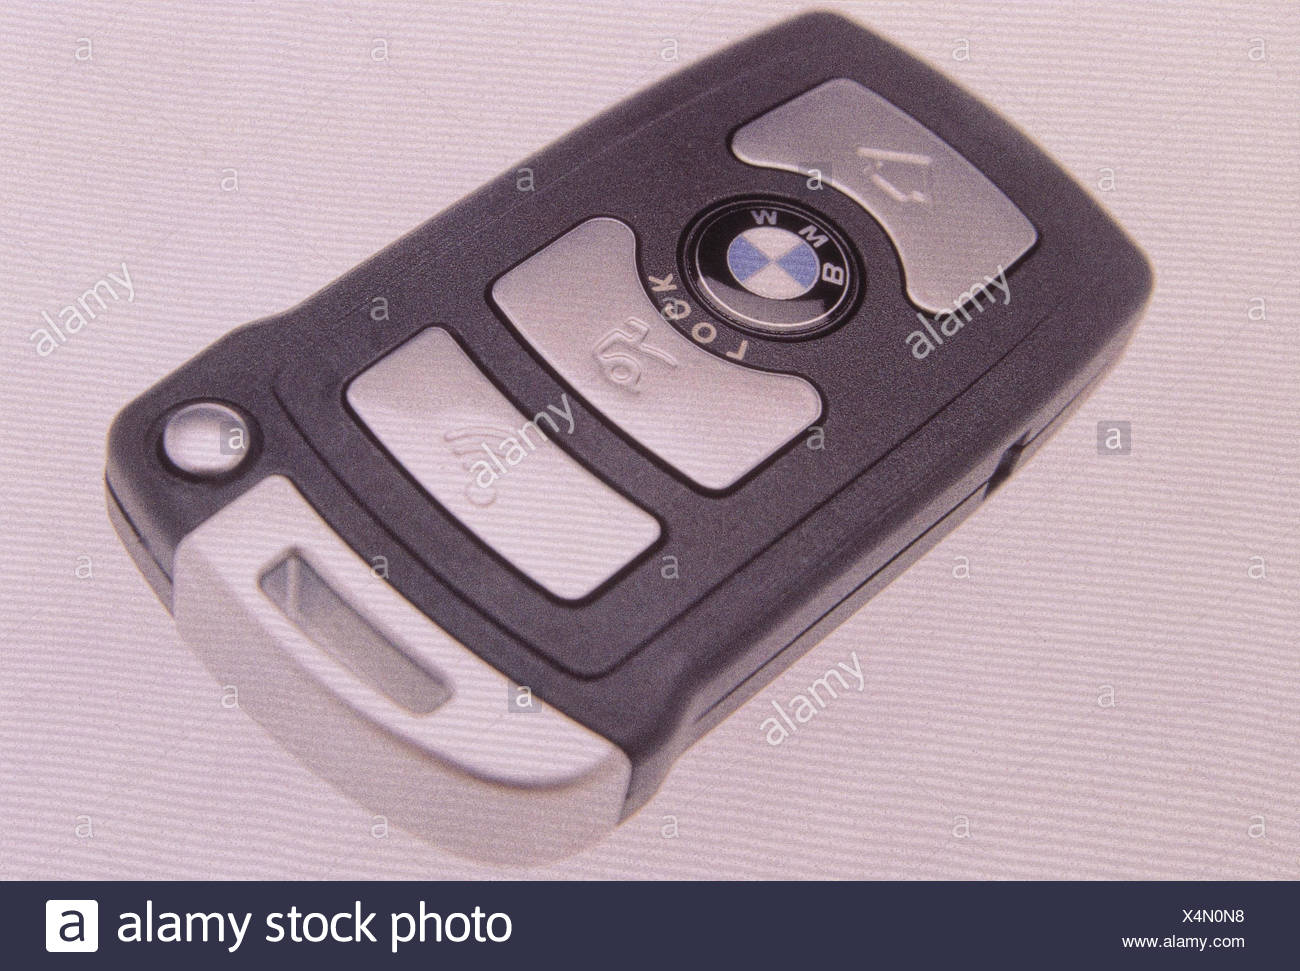 Car keys, BMW 7er Series, Remote control, Car, Vehicle